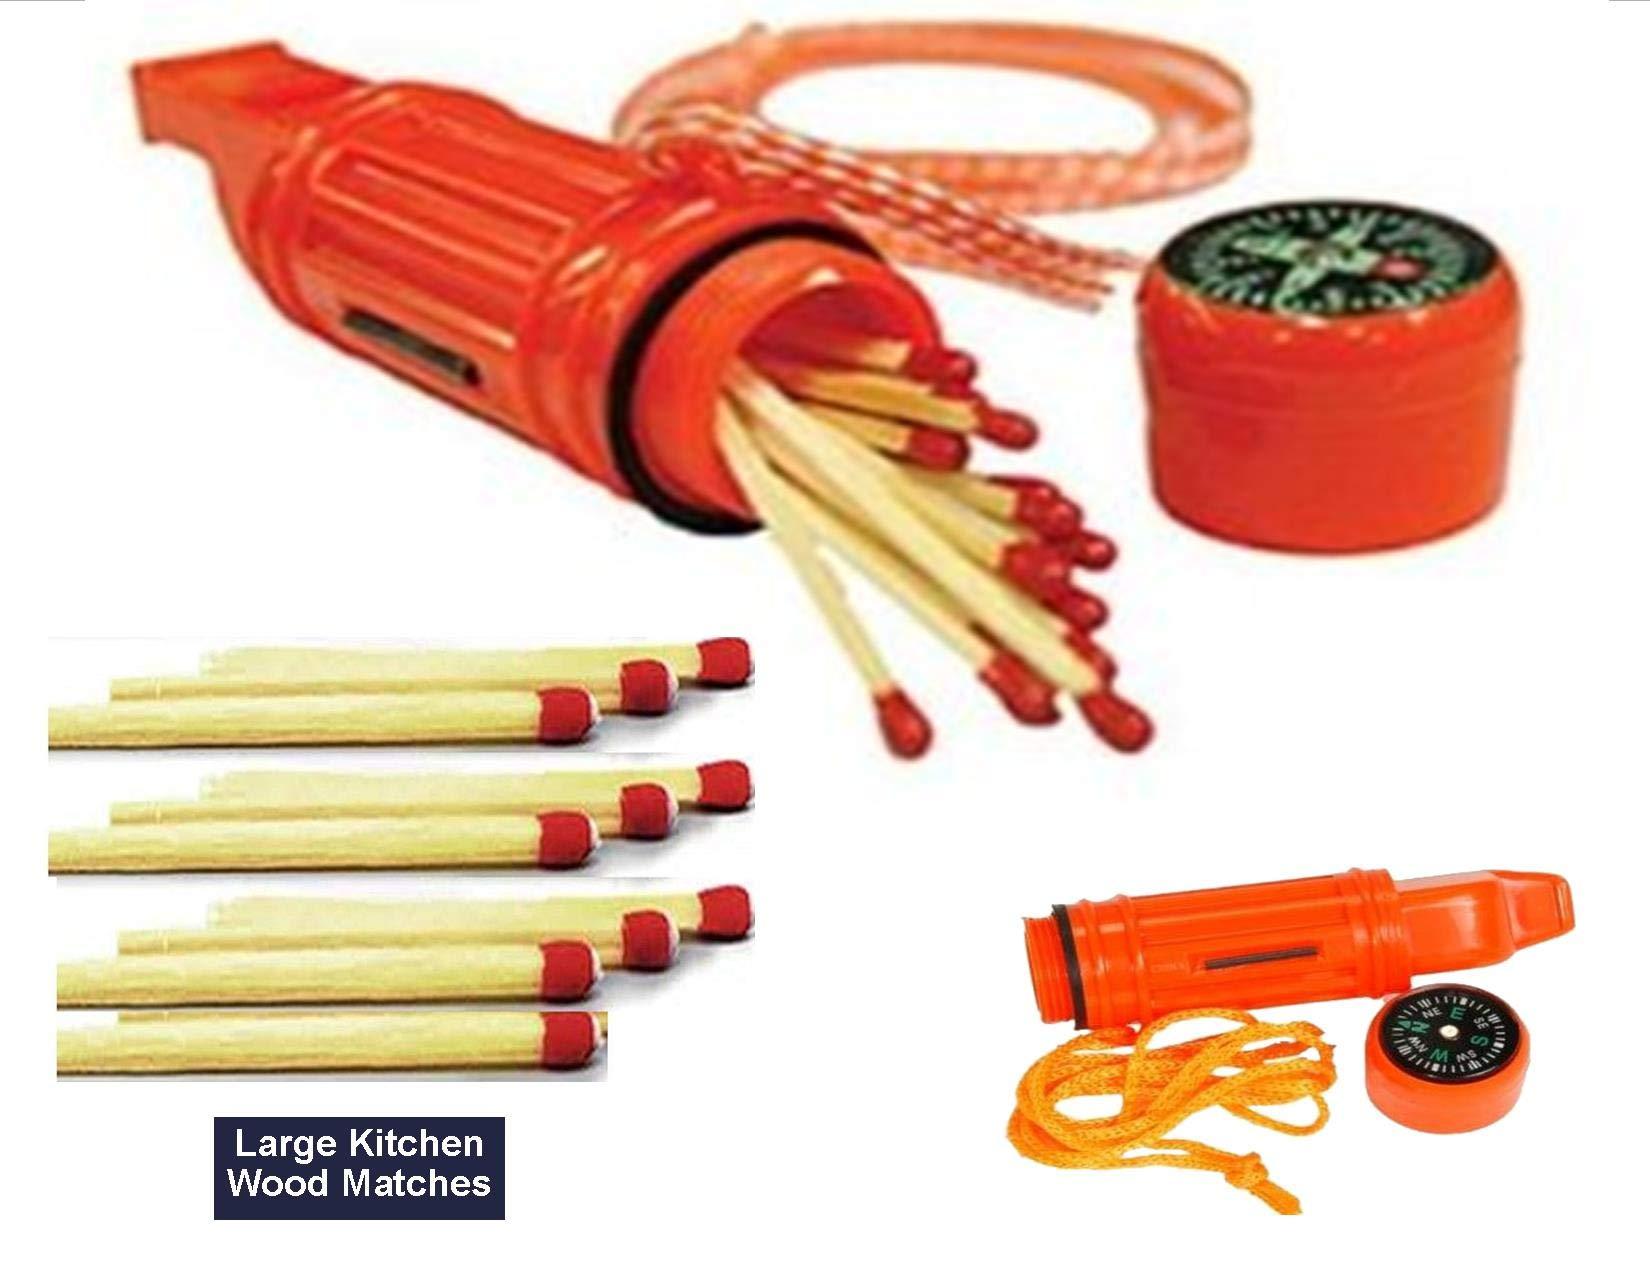 EDOG 6 N 1 Emergency Blaze Orange Survival Whistle & 10+ Hand Stuffed Large Kitchen Wood Matches   Compass   Waterproof Match Holder   Signal Mirror   Lanyard (1) by EDOG